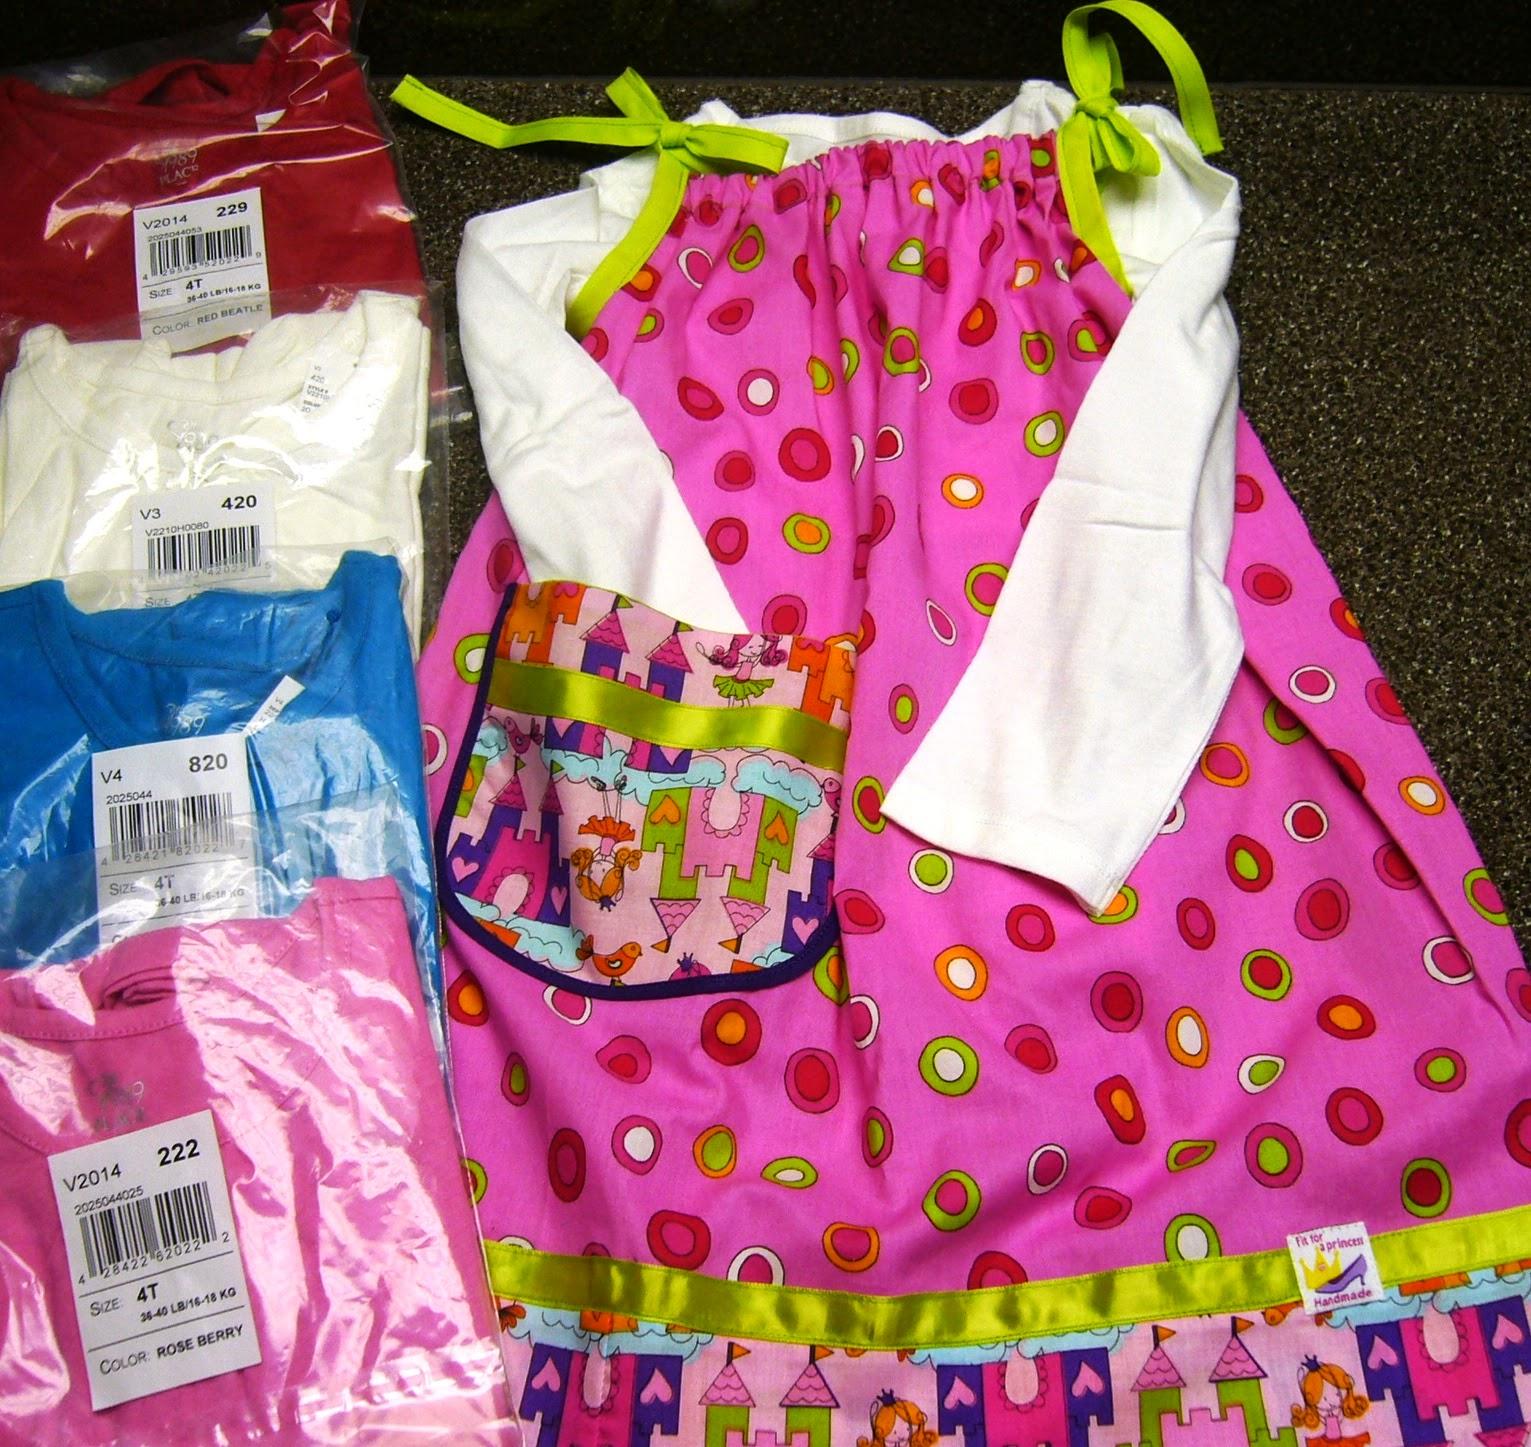 Princess pillowcase dress for Operation Christmas Child shoebox.